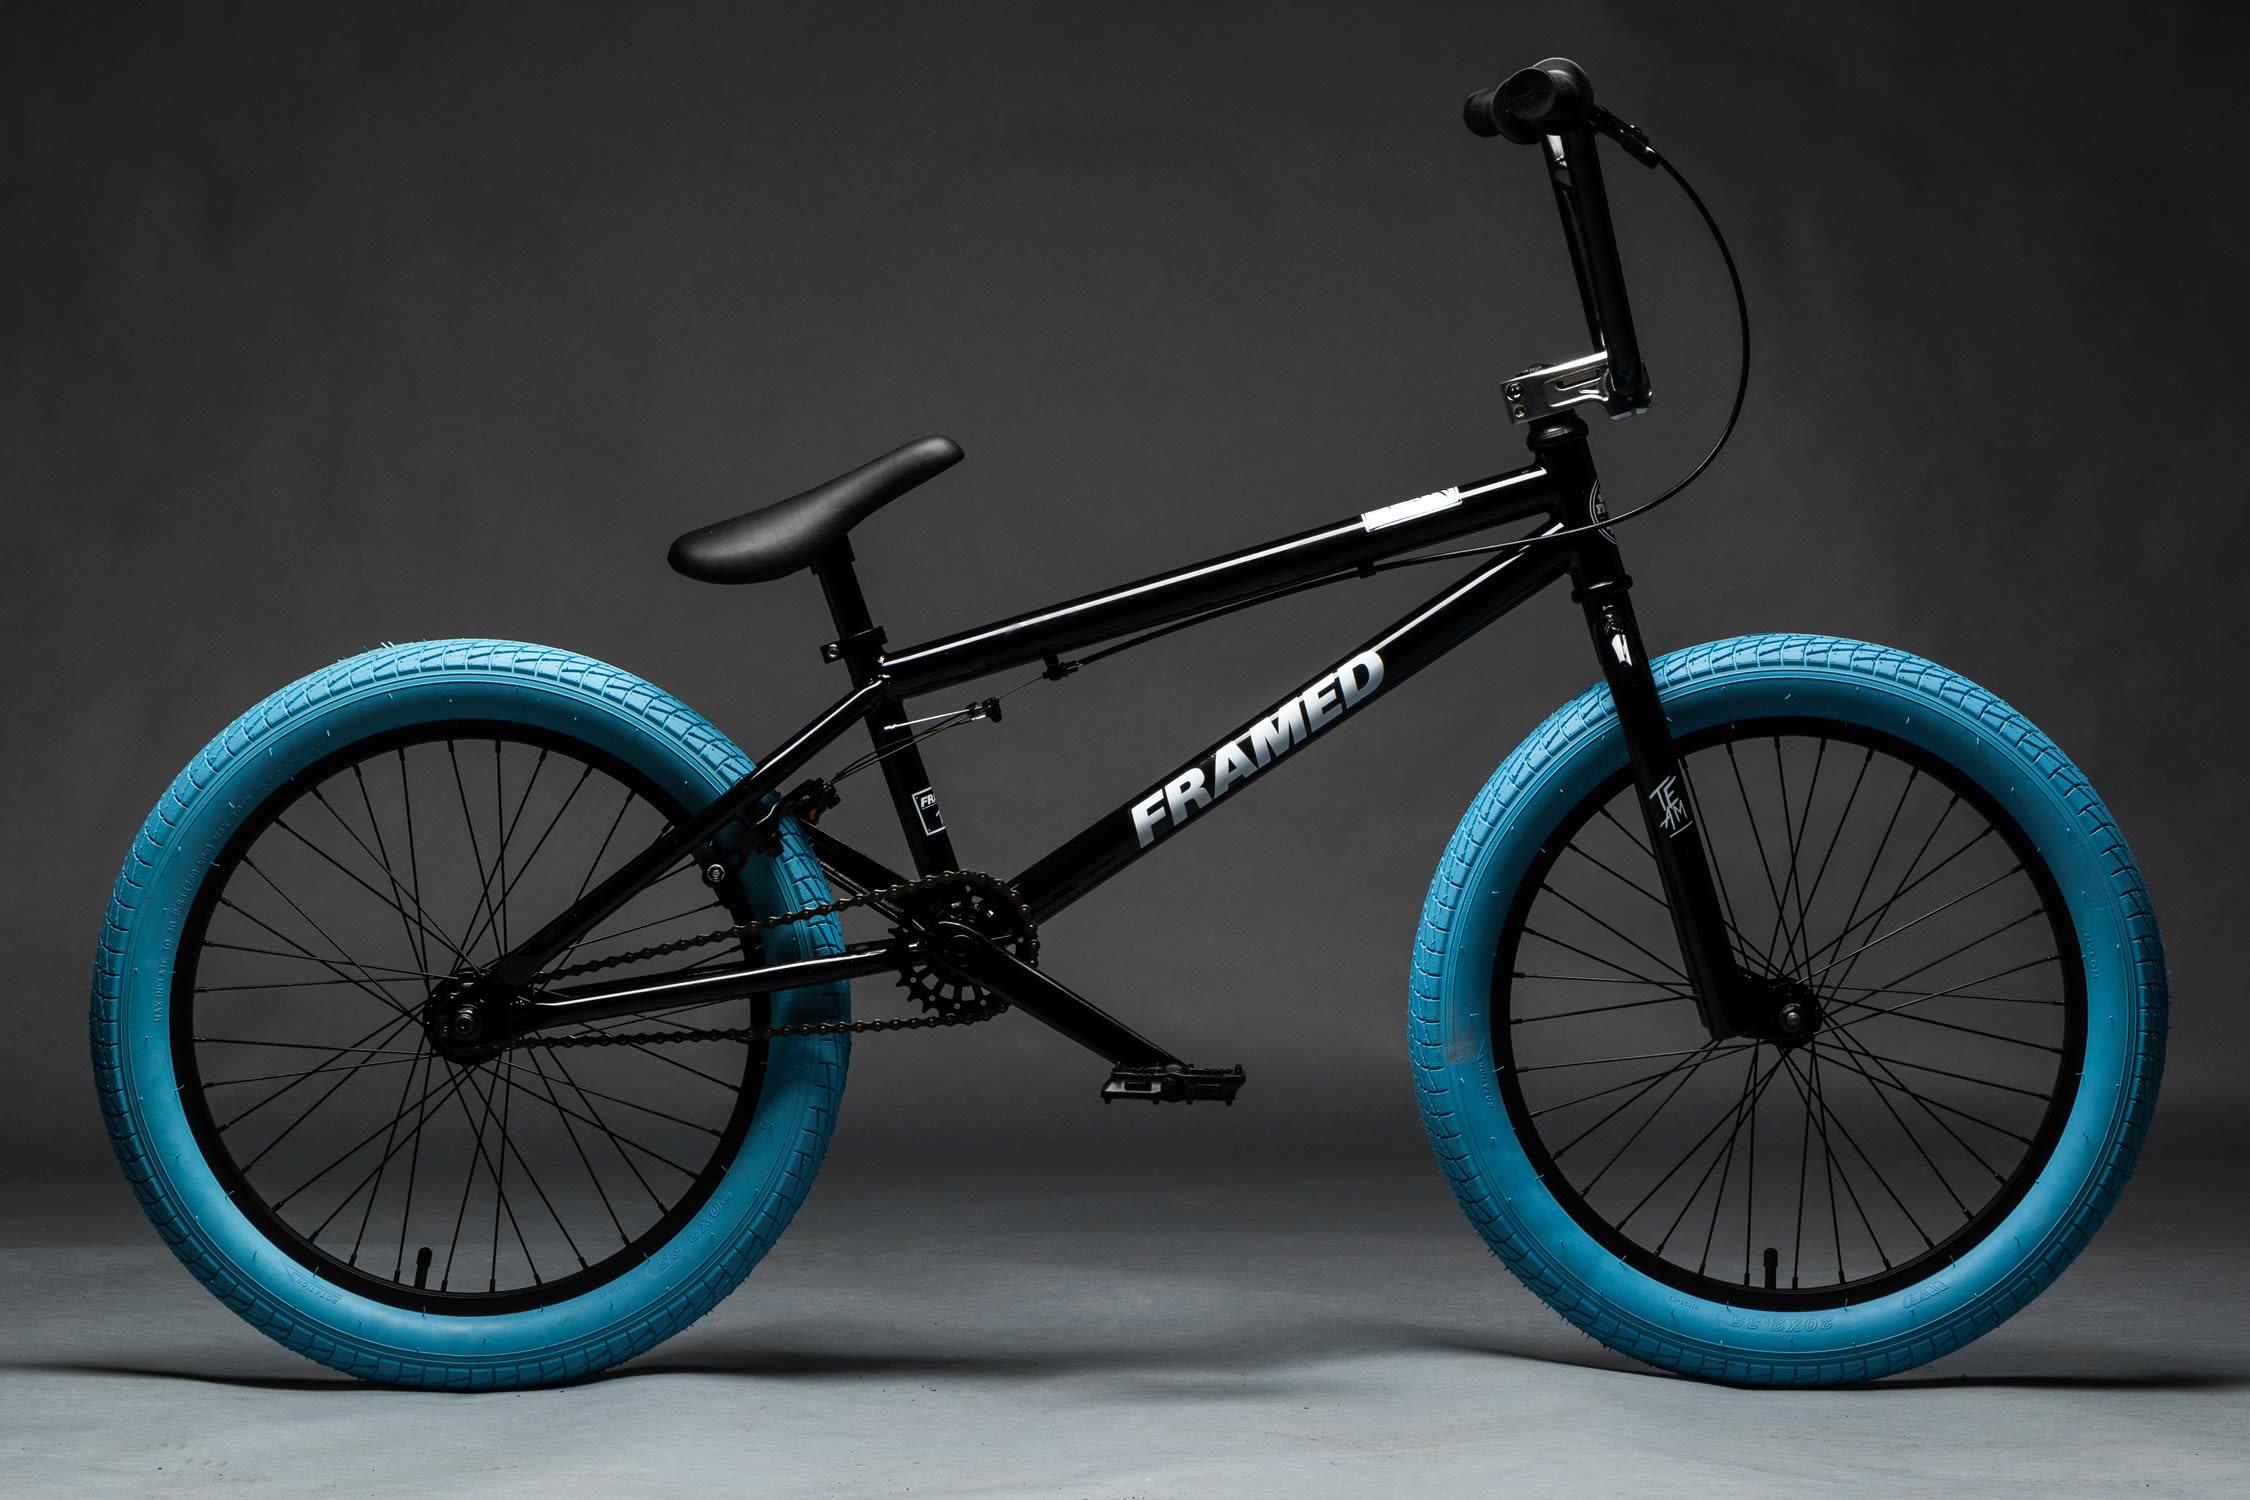 Framed Team Bmx Bike 2019